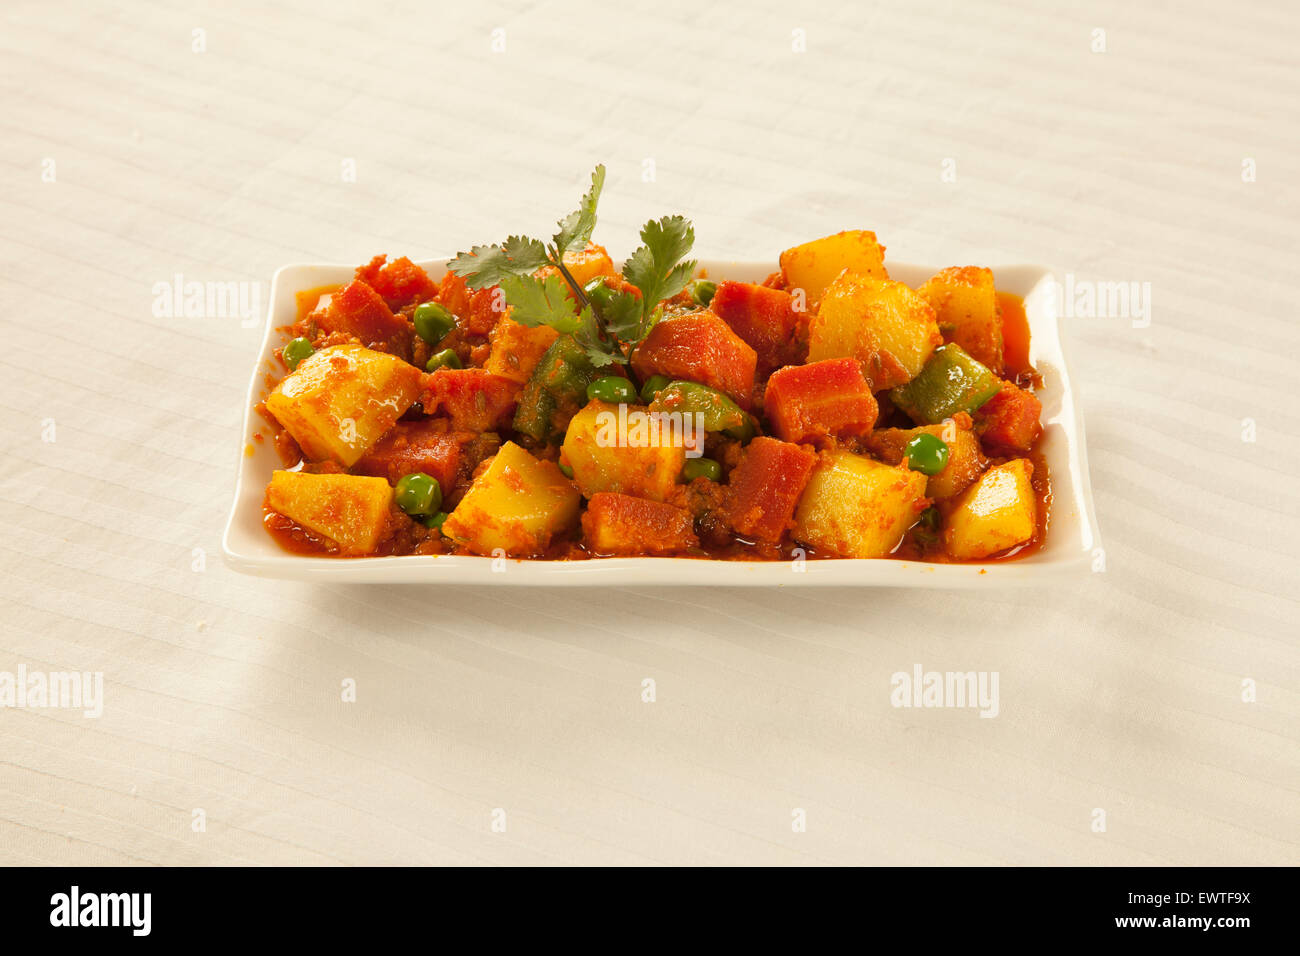 Mixed vegetable Indian Pakistani masala cuisine - Stock Image